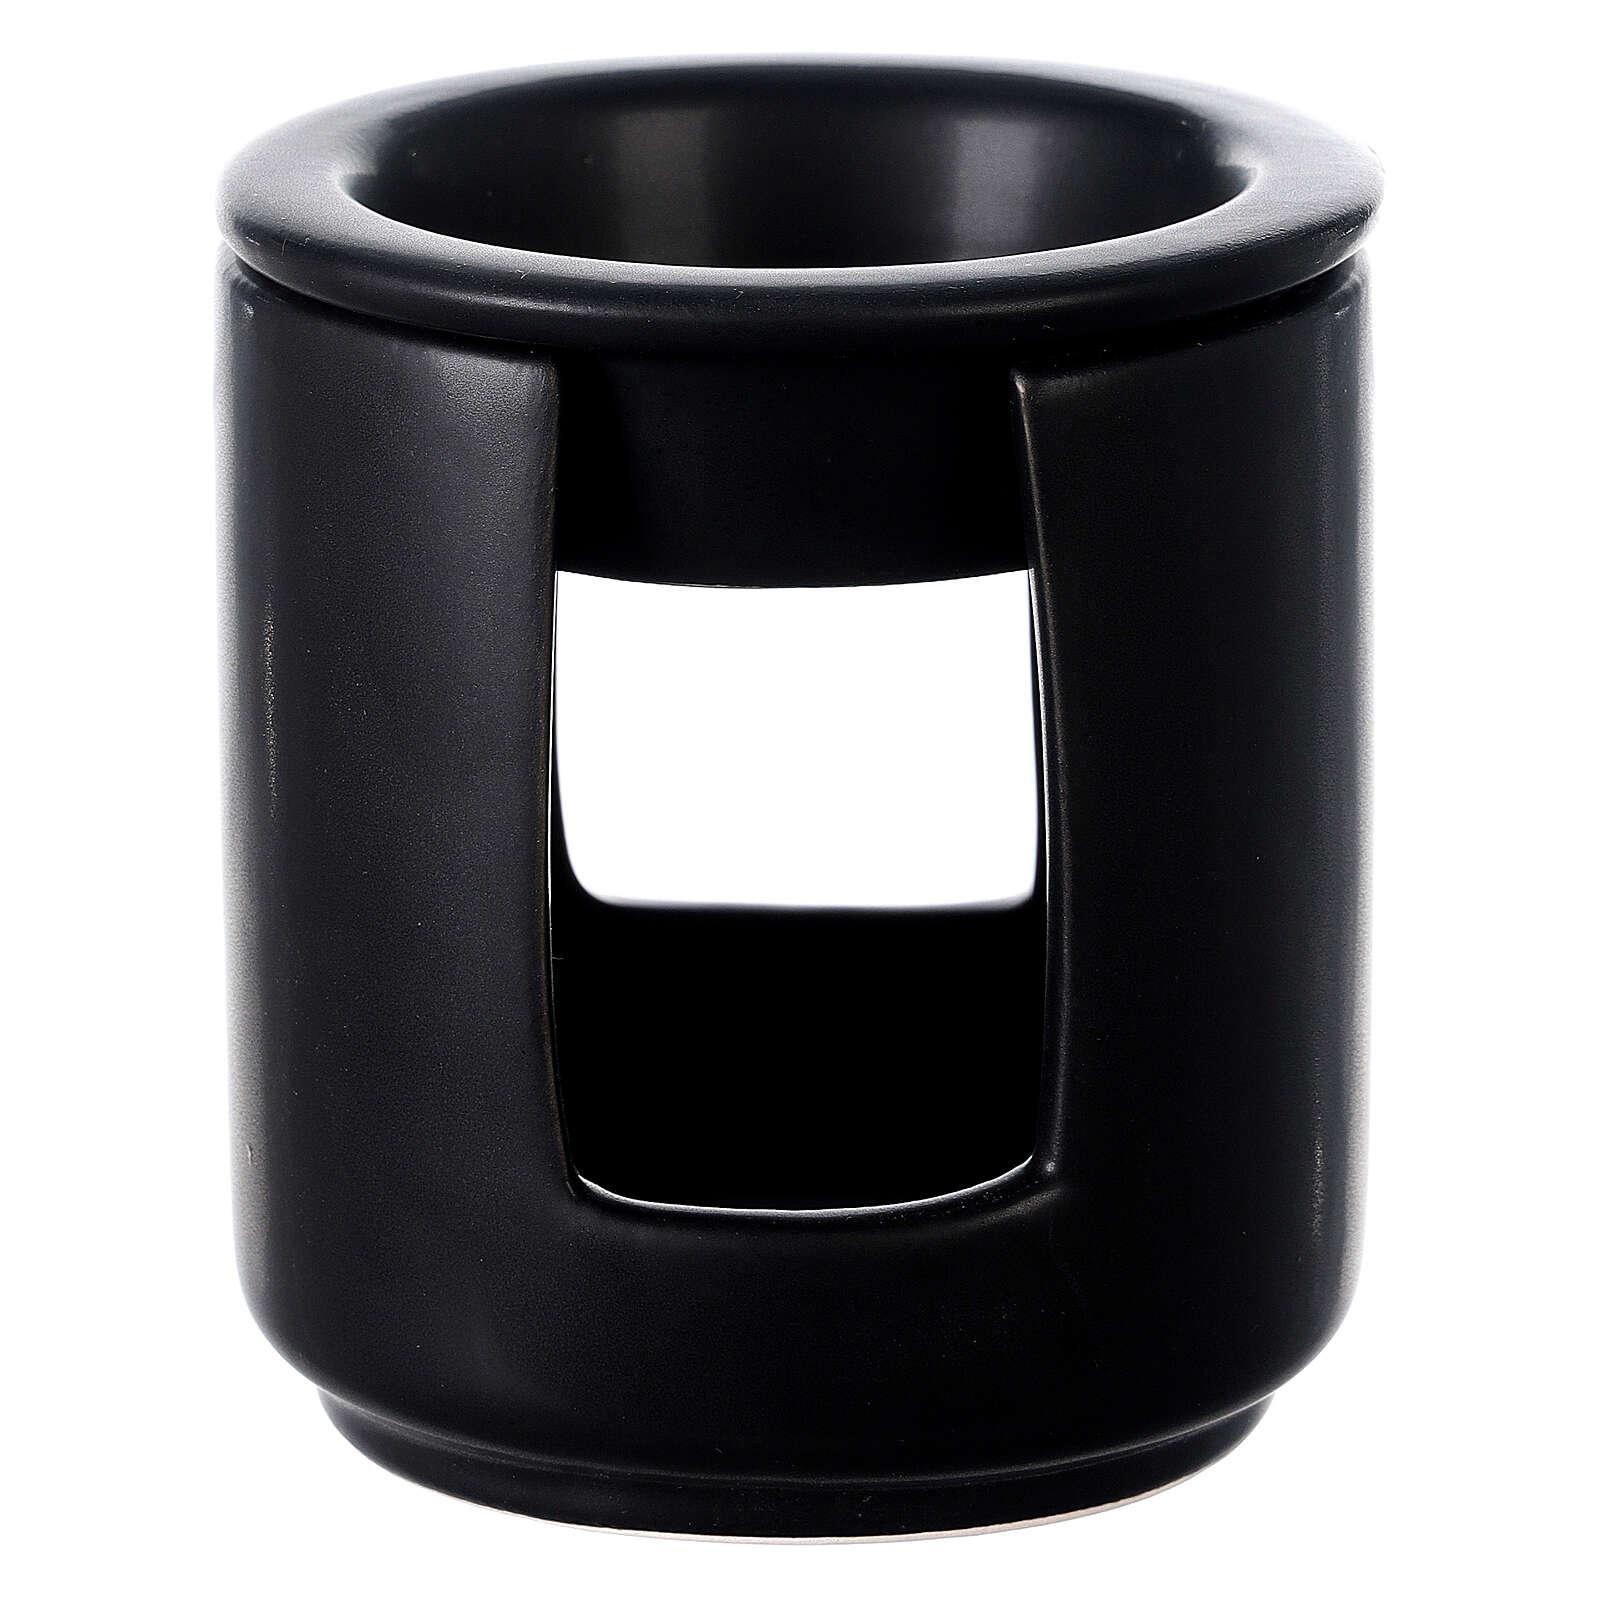 Diffusore essenze ceramica nero 10x9 cm 3